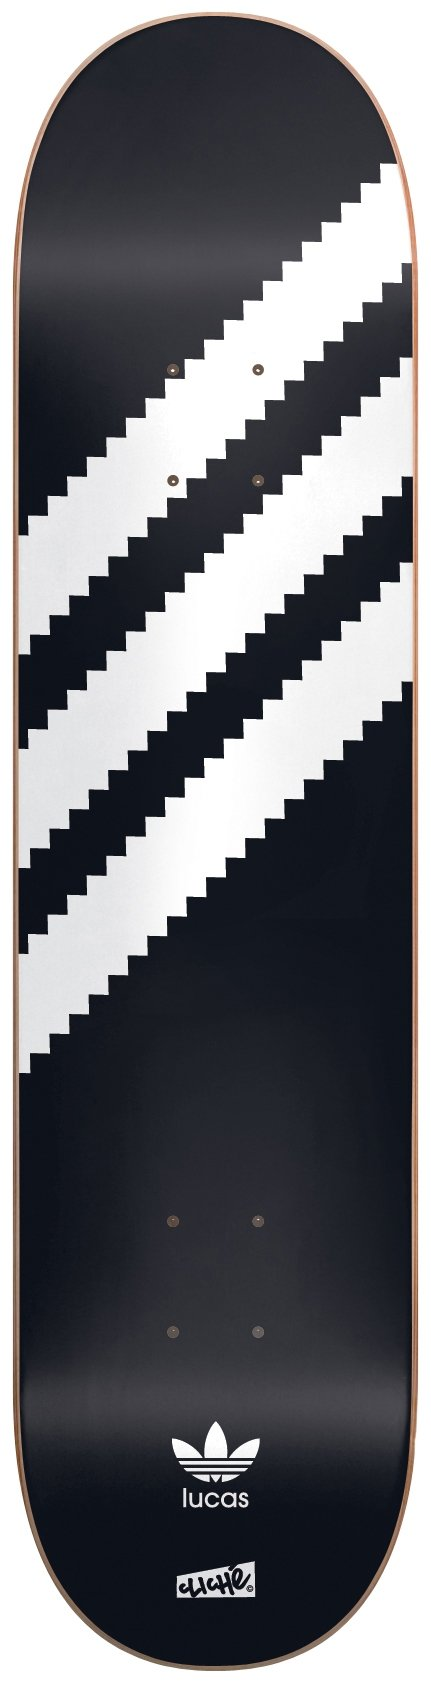 Cliche Adidas colab.JPG